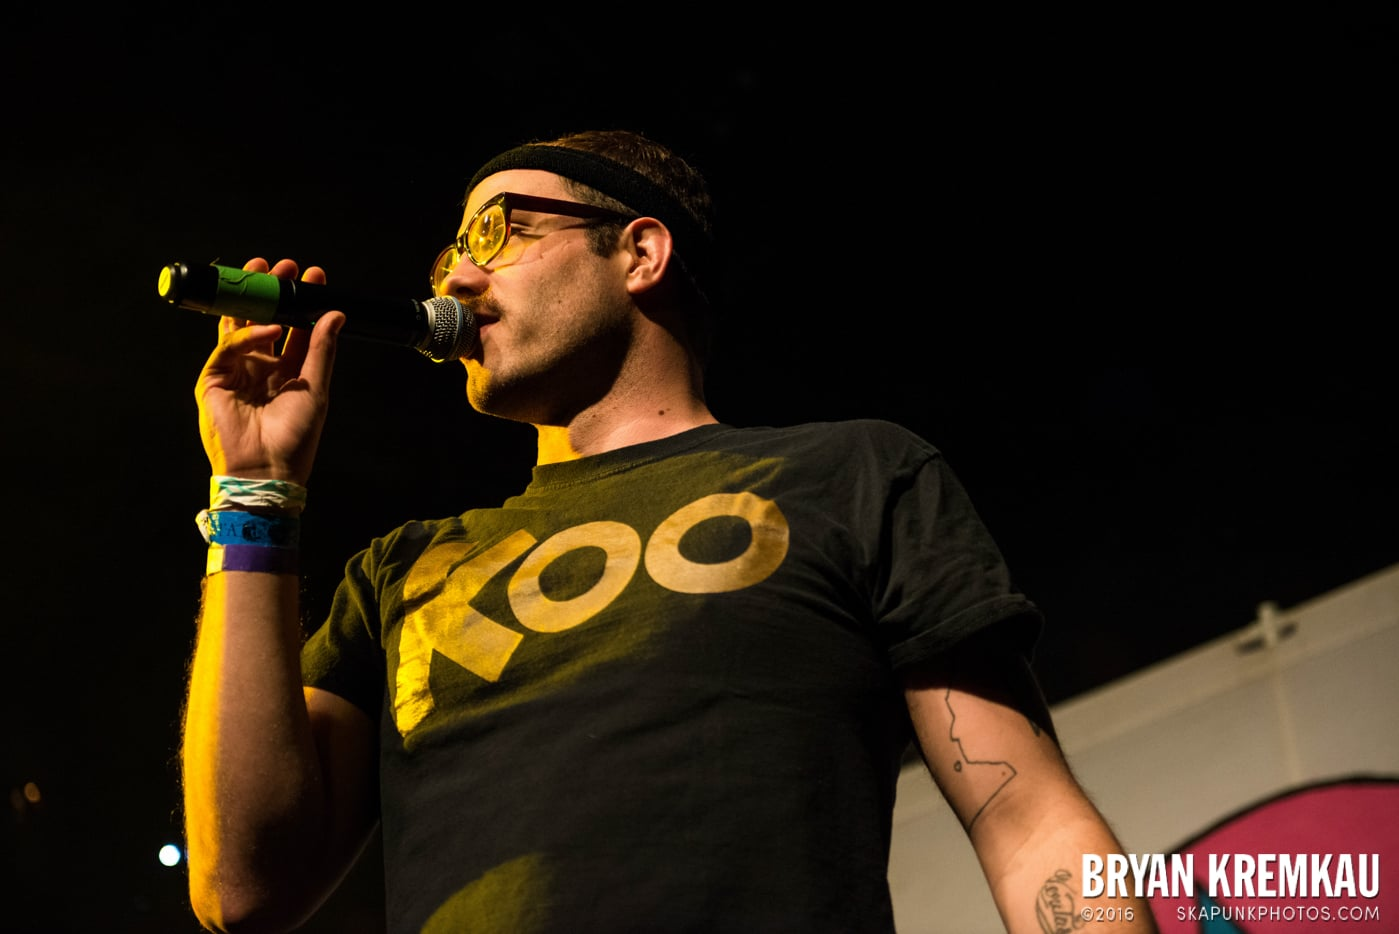 Koo Koo Kanga Roo @ Irving Plaza, NYC - 5.7.14 (26)